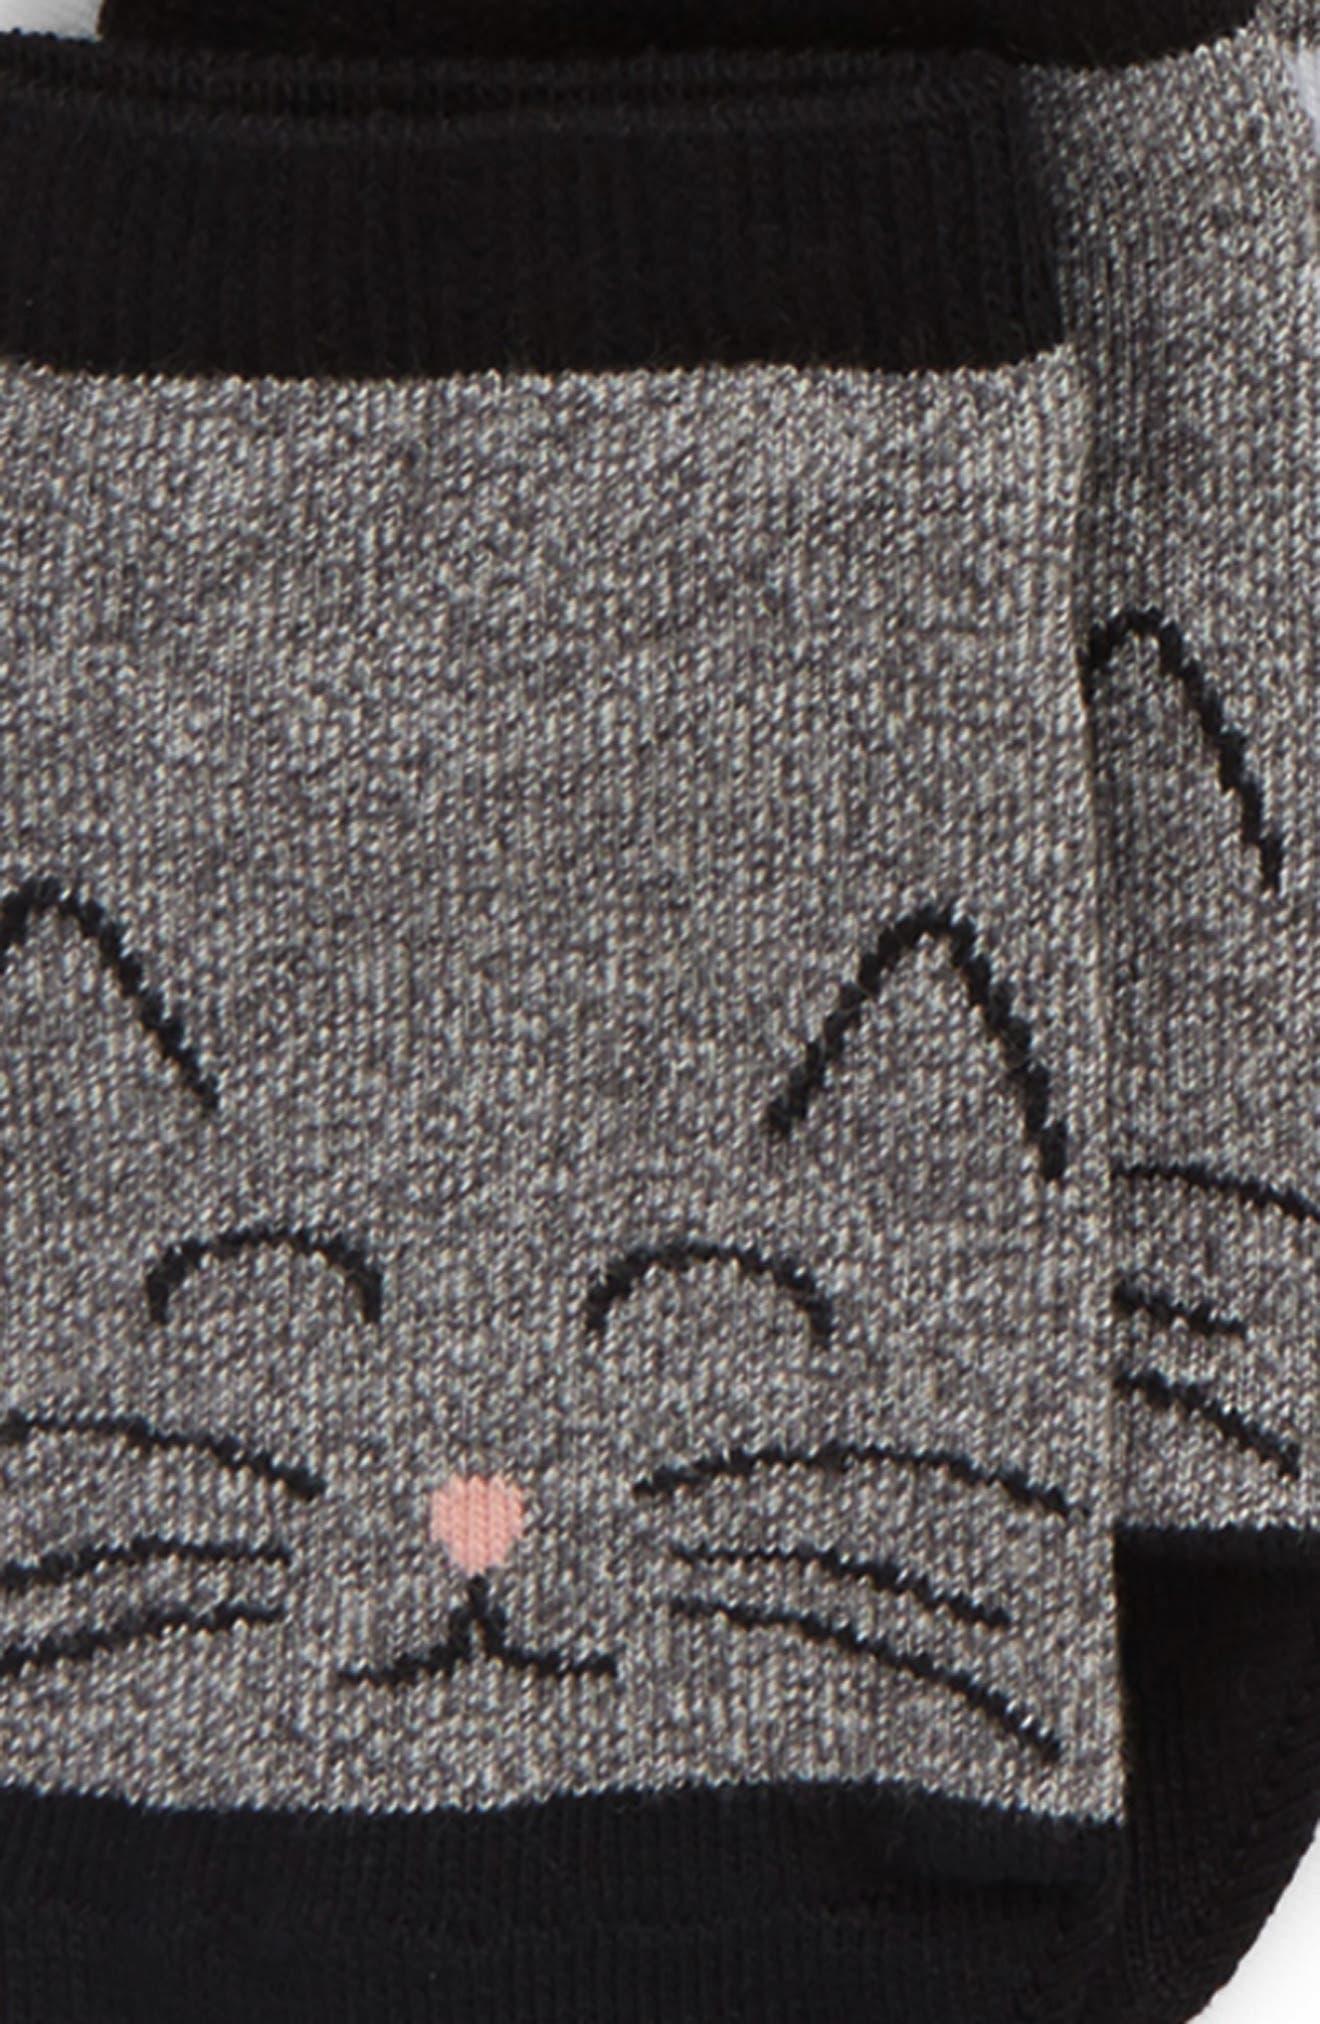 6-Pack Assorted Low Cut Socks,                             Alternate thumbnail 2, color,                             Black Multi